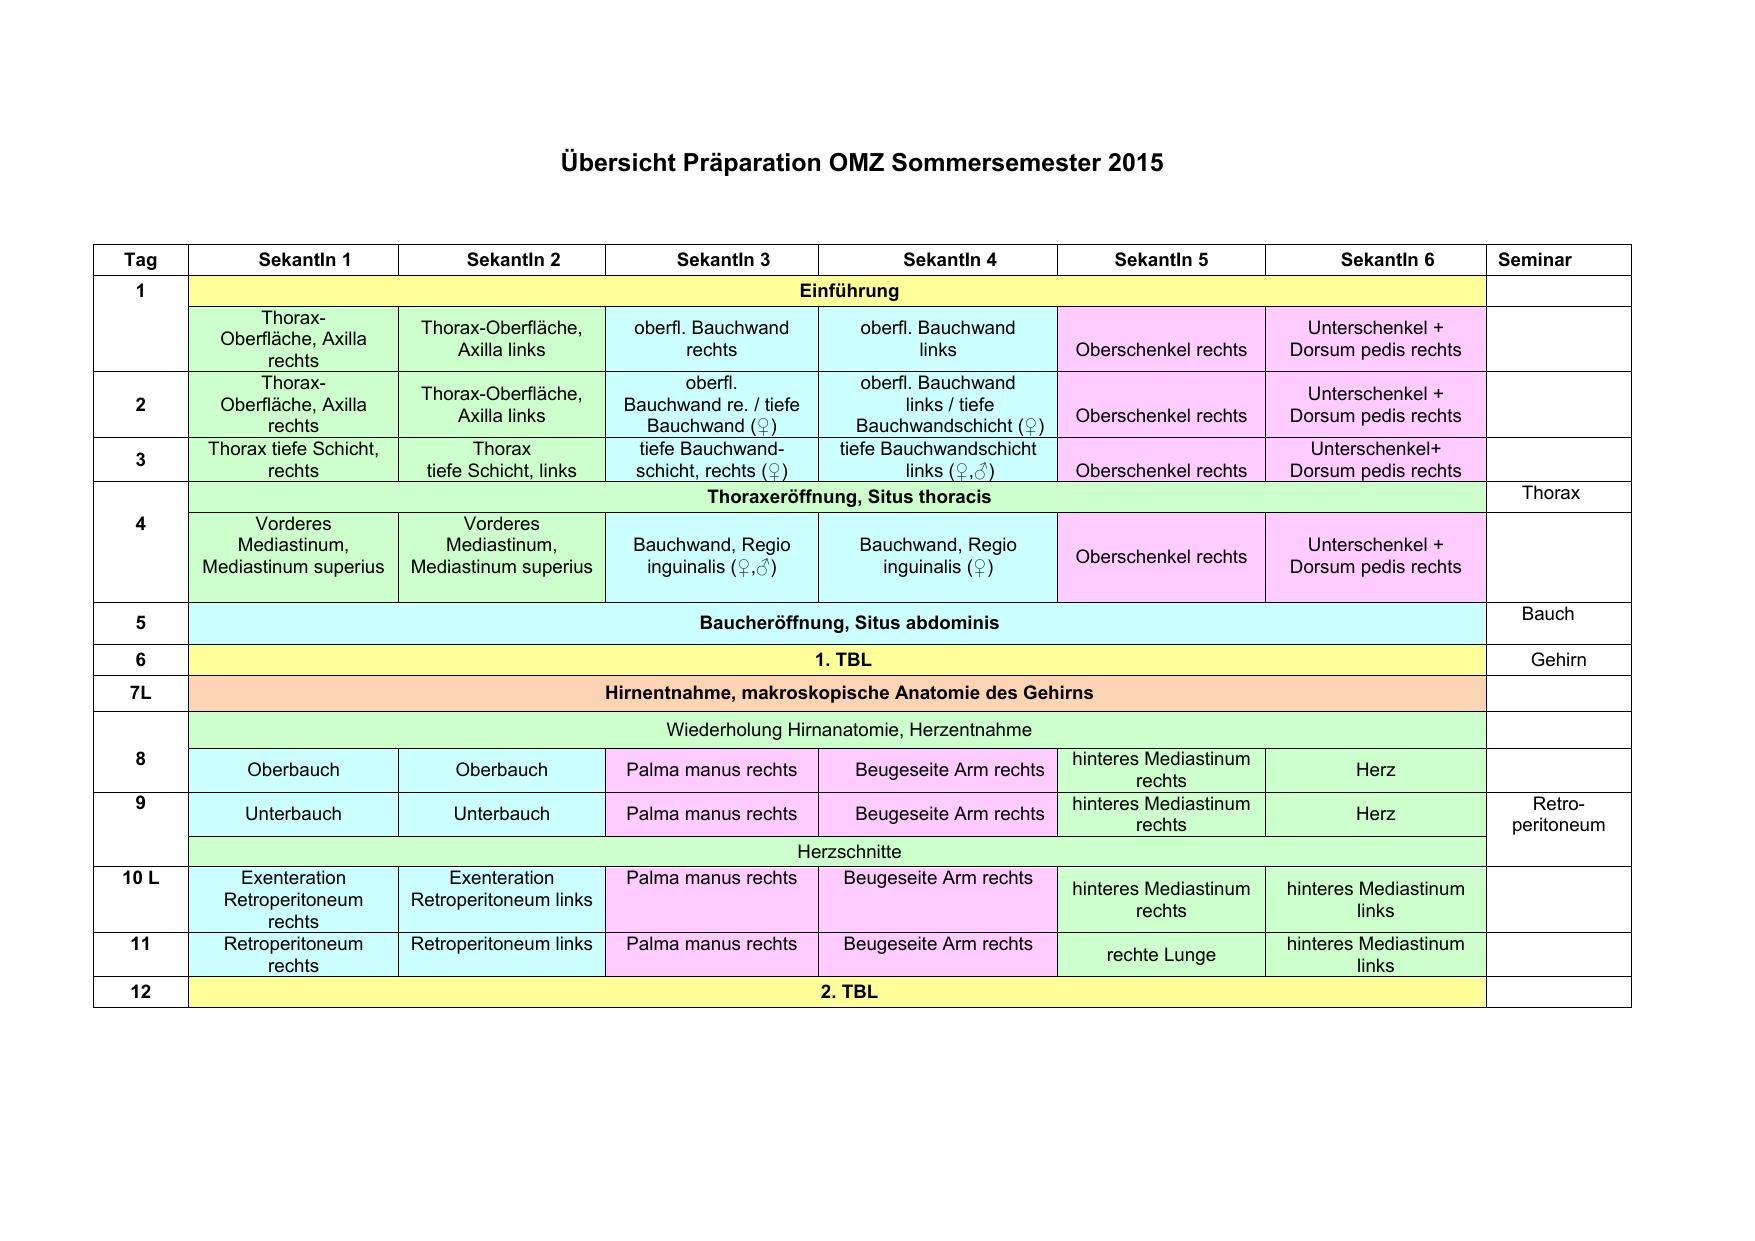 Übersicht Präparation OMZ Sommersemester 2015